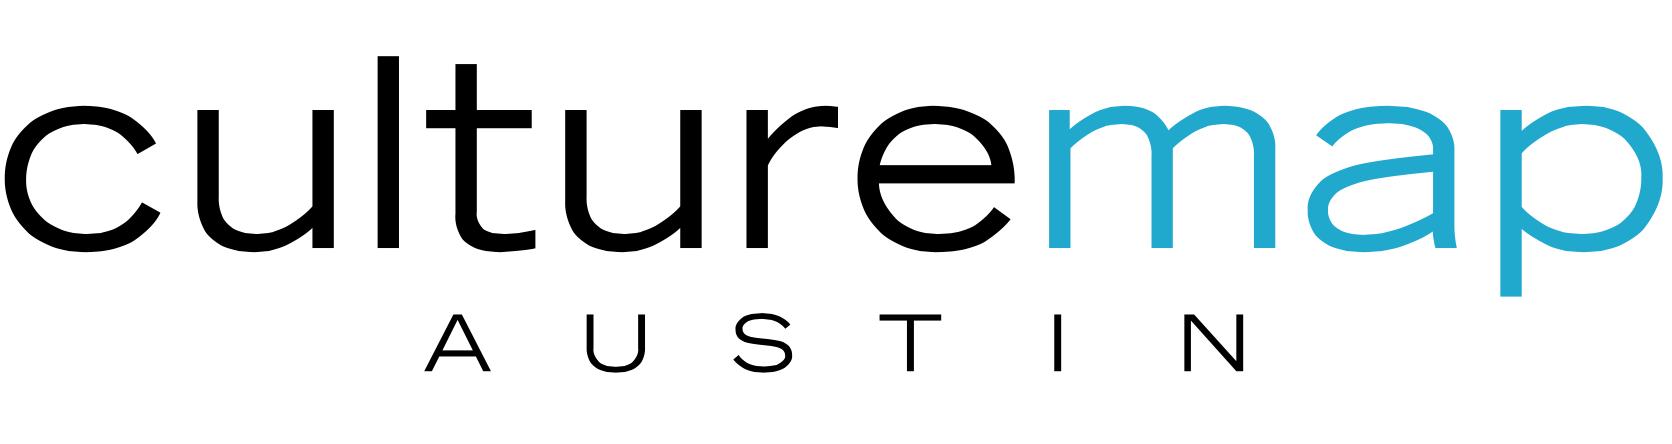 culturemap-austin-logo.png